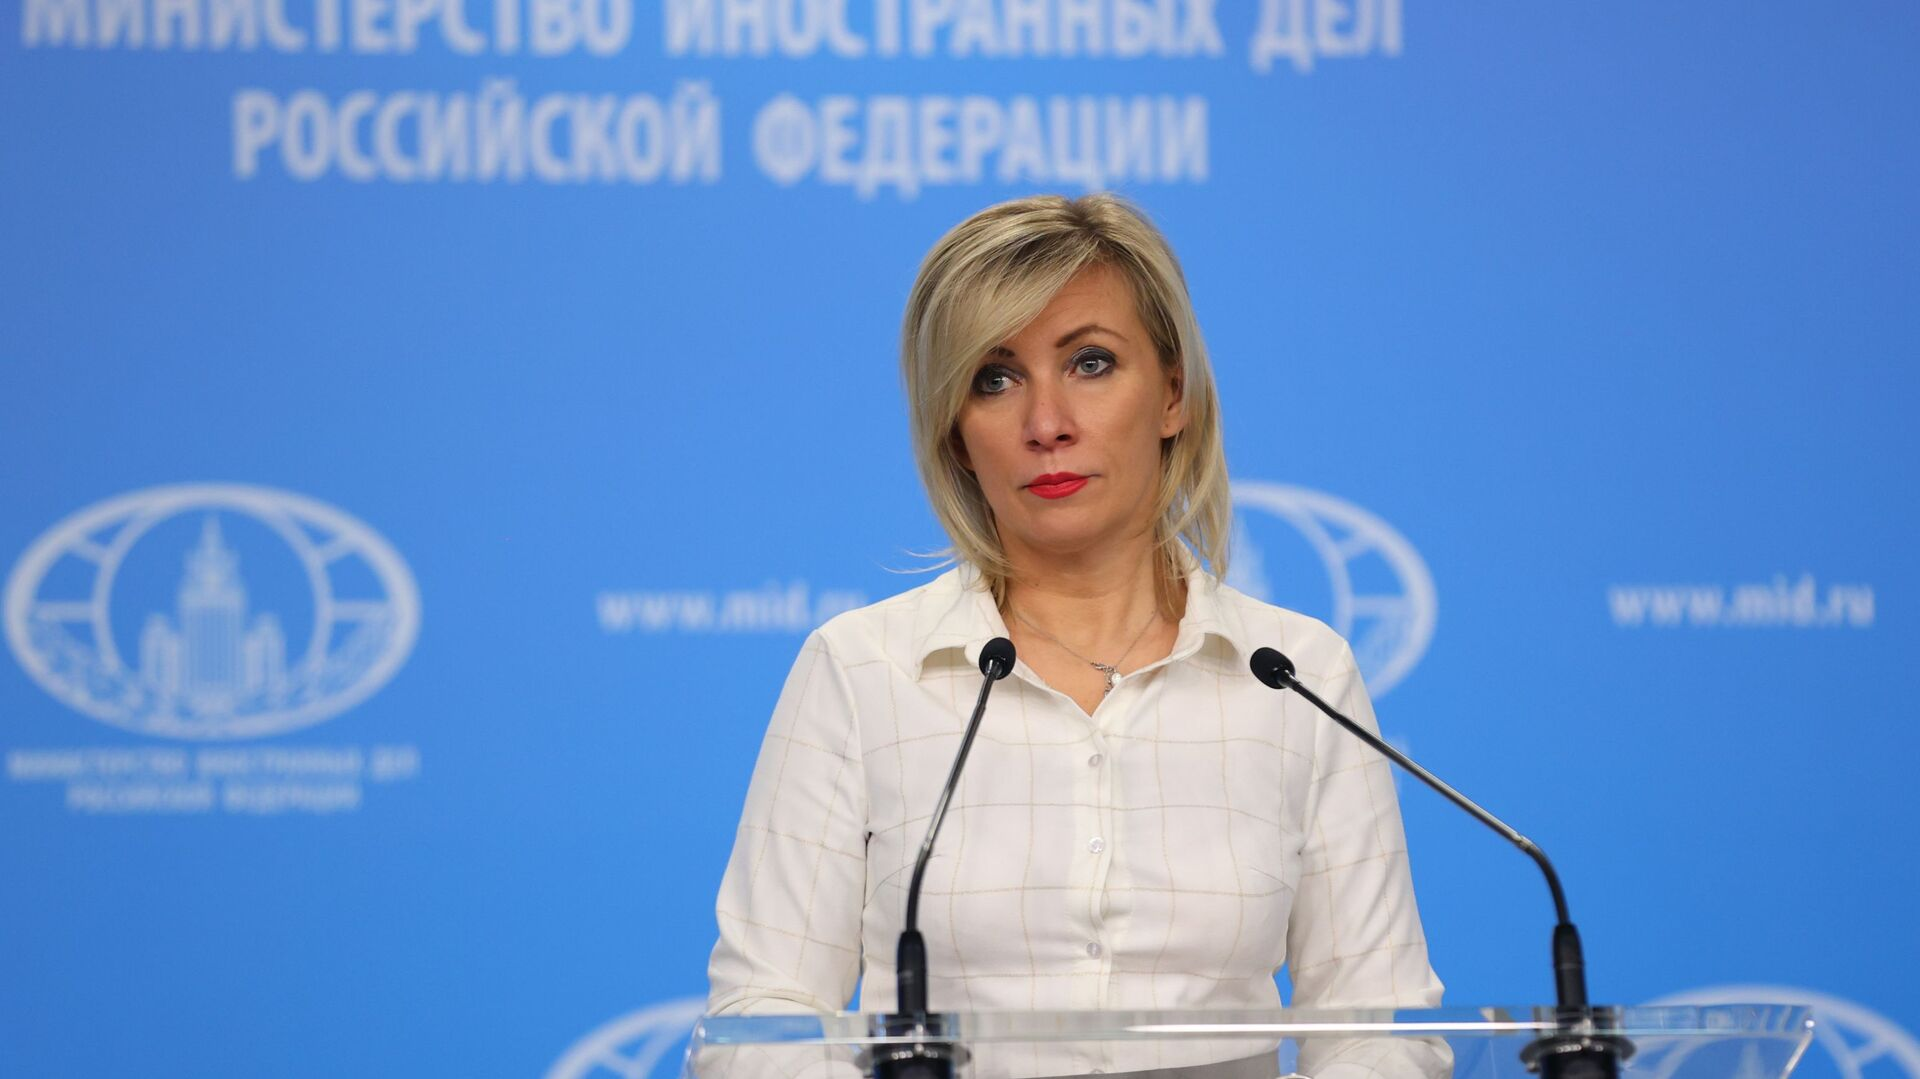 María Zajárova, portavoz del Ministério de Exteriores de Rusia - Sputnik Mundo, 1920, 12.03.2021